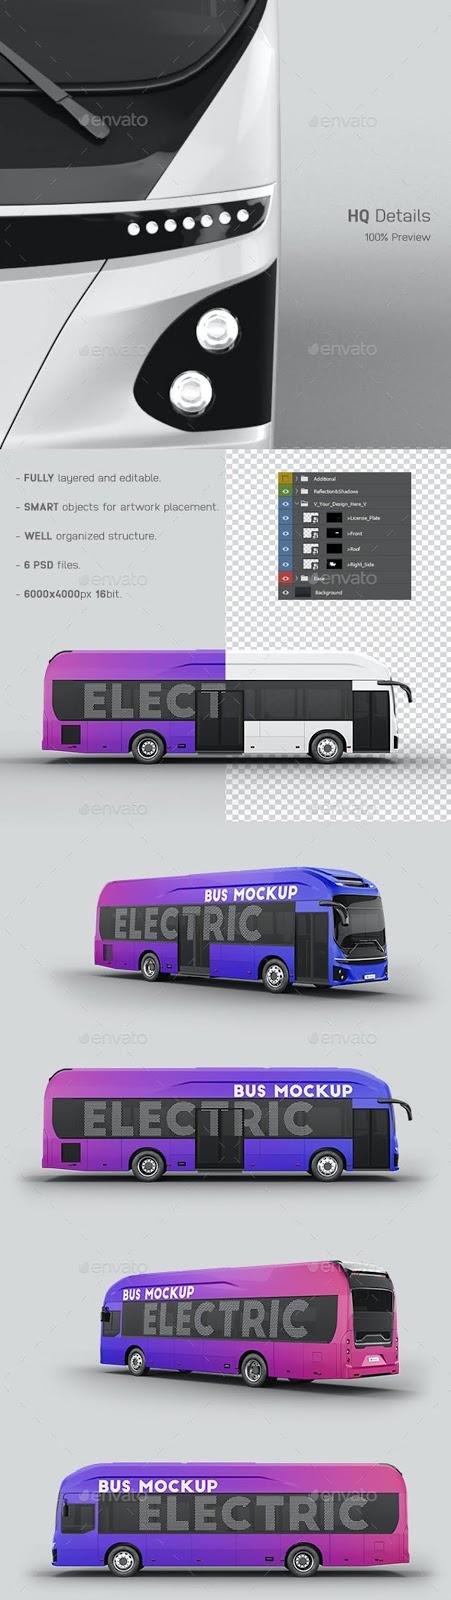 Hyundai Electric City Bus Mockup 27476773 Free